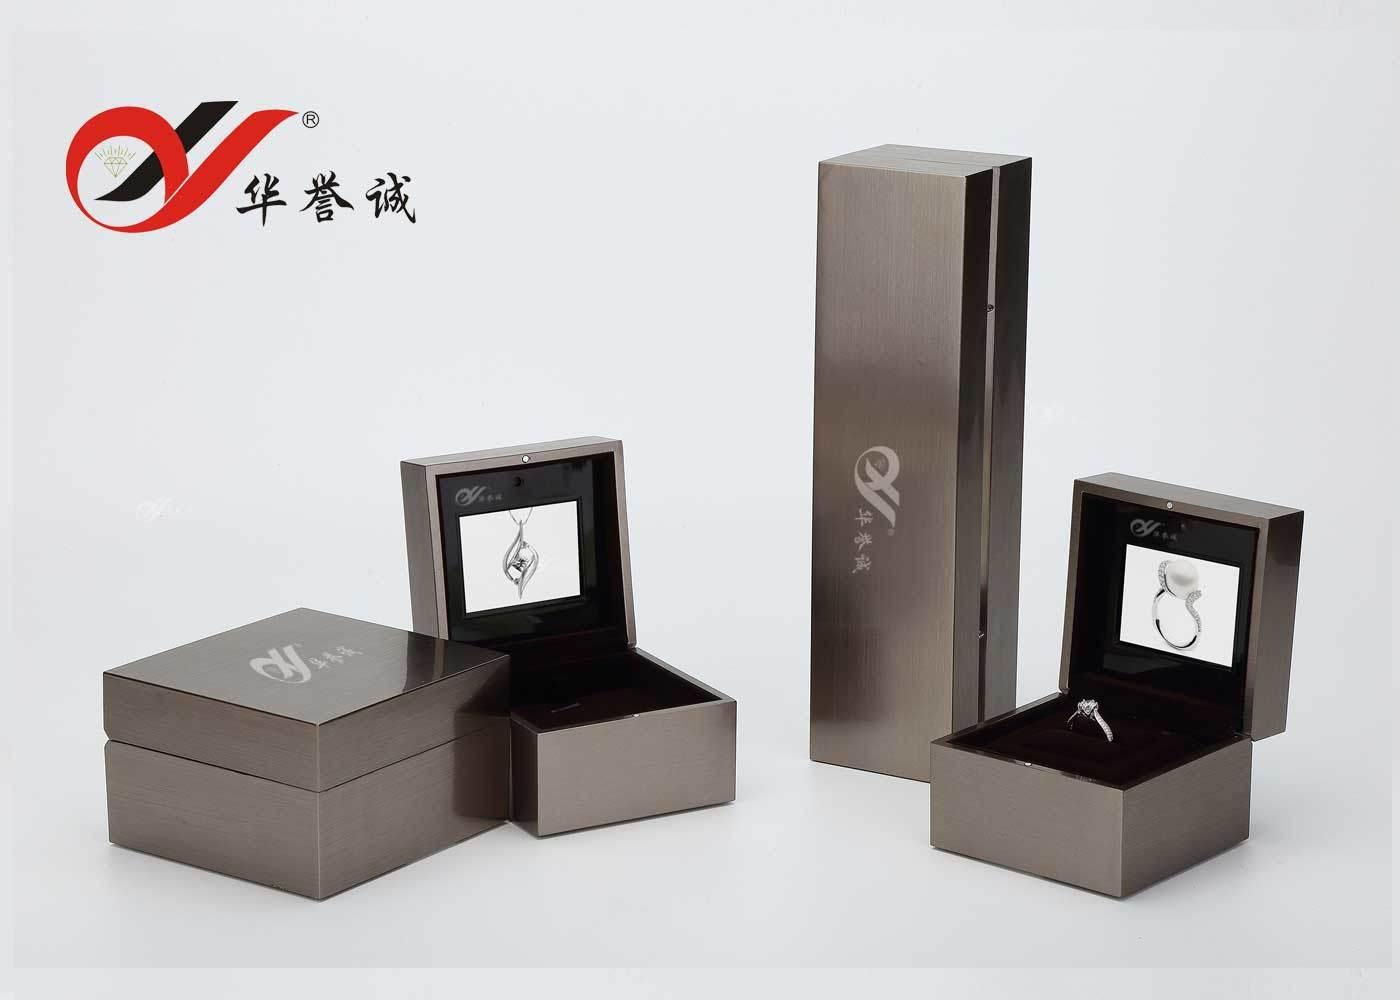 Collar de terciopelo caja de presentación de regalo de joyería anillo pulsera encanto regalo Caja de almacenamiento